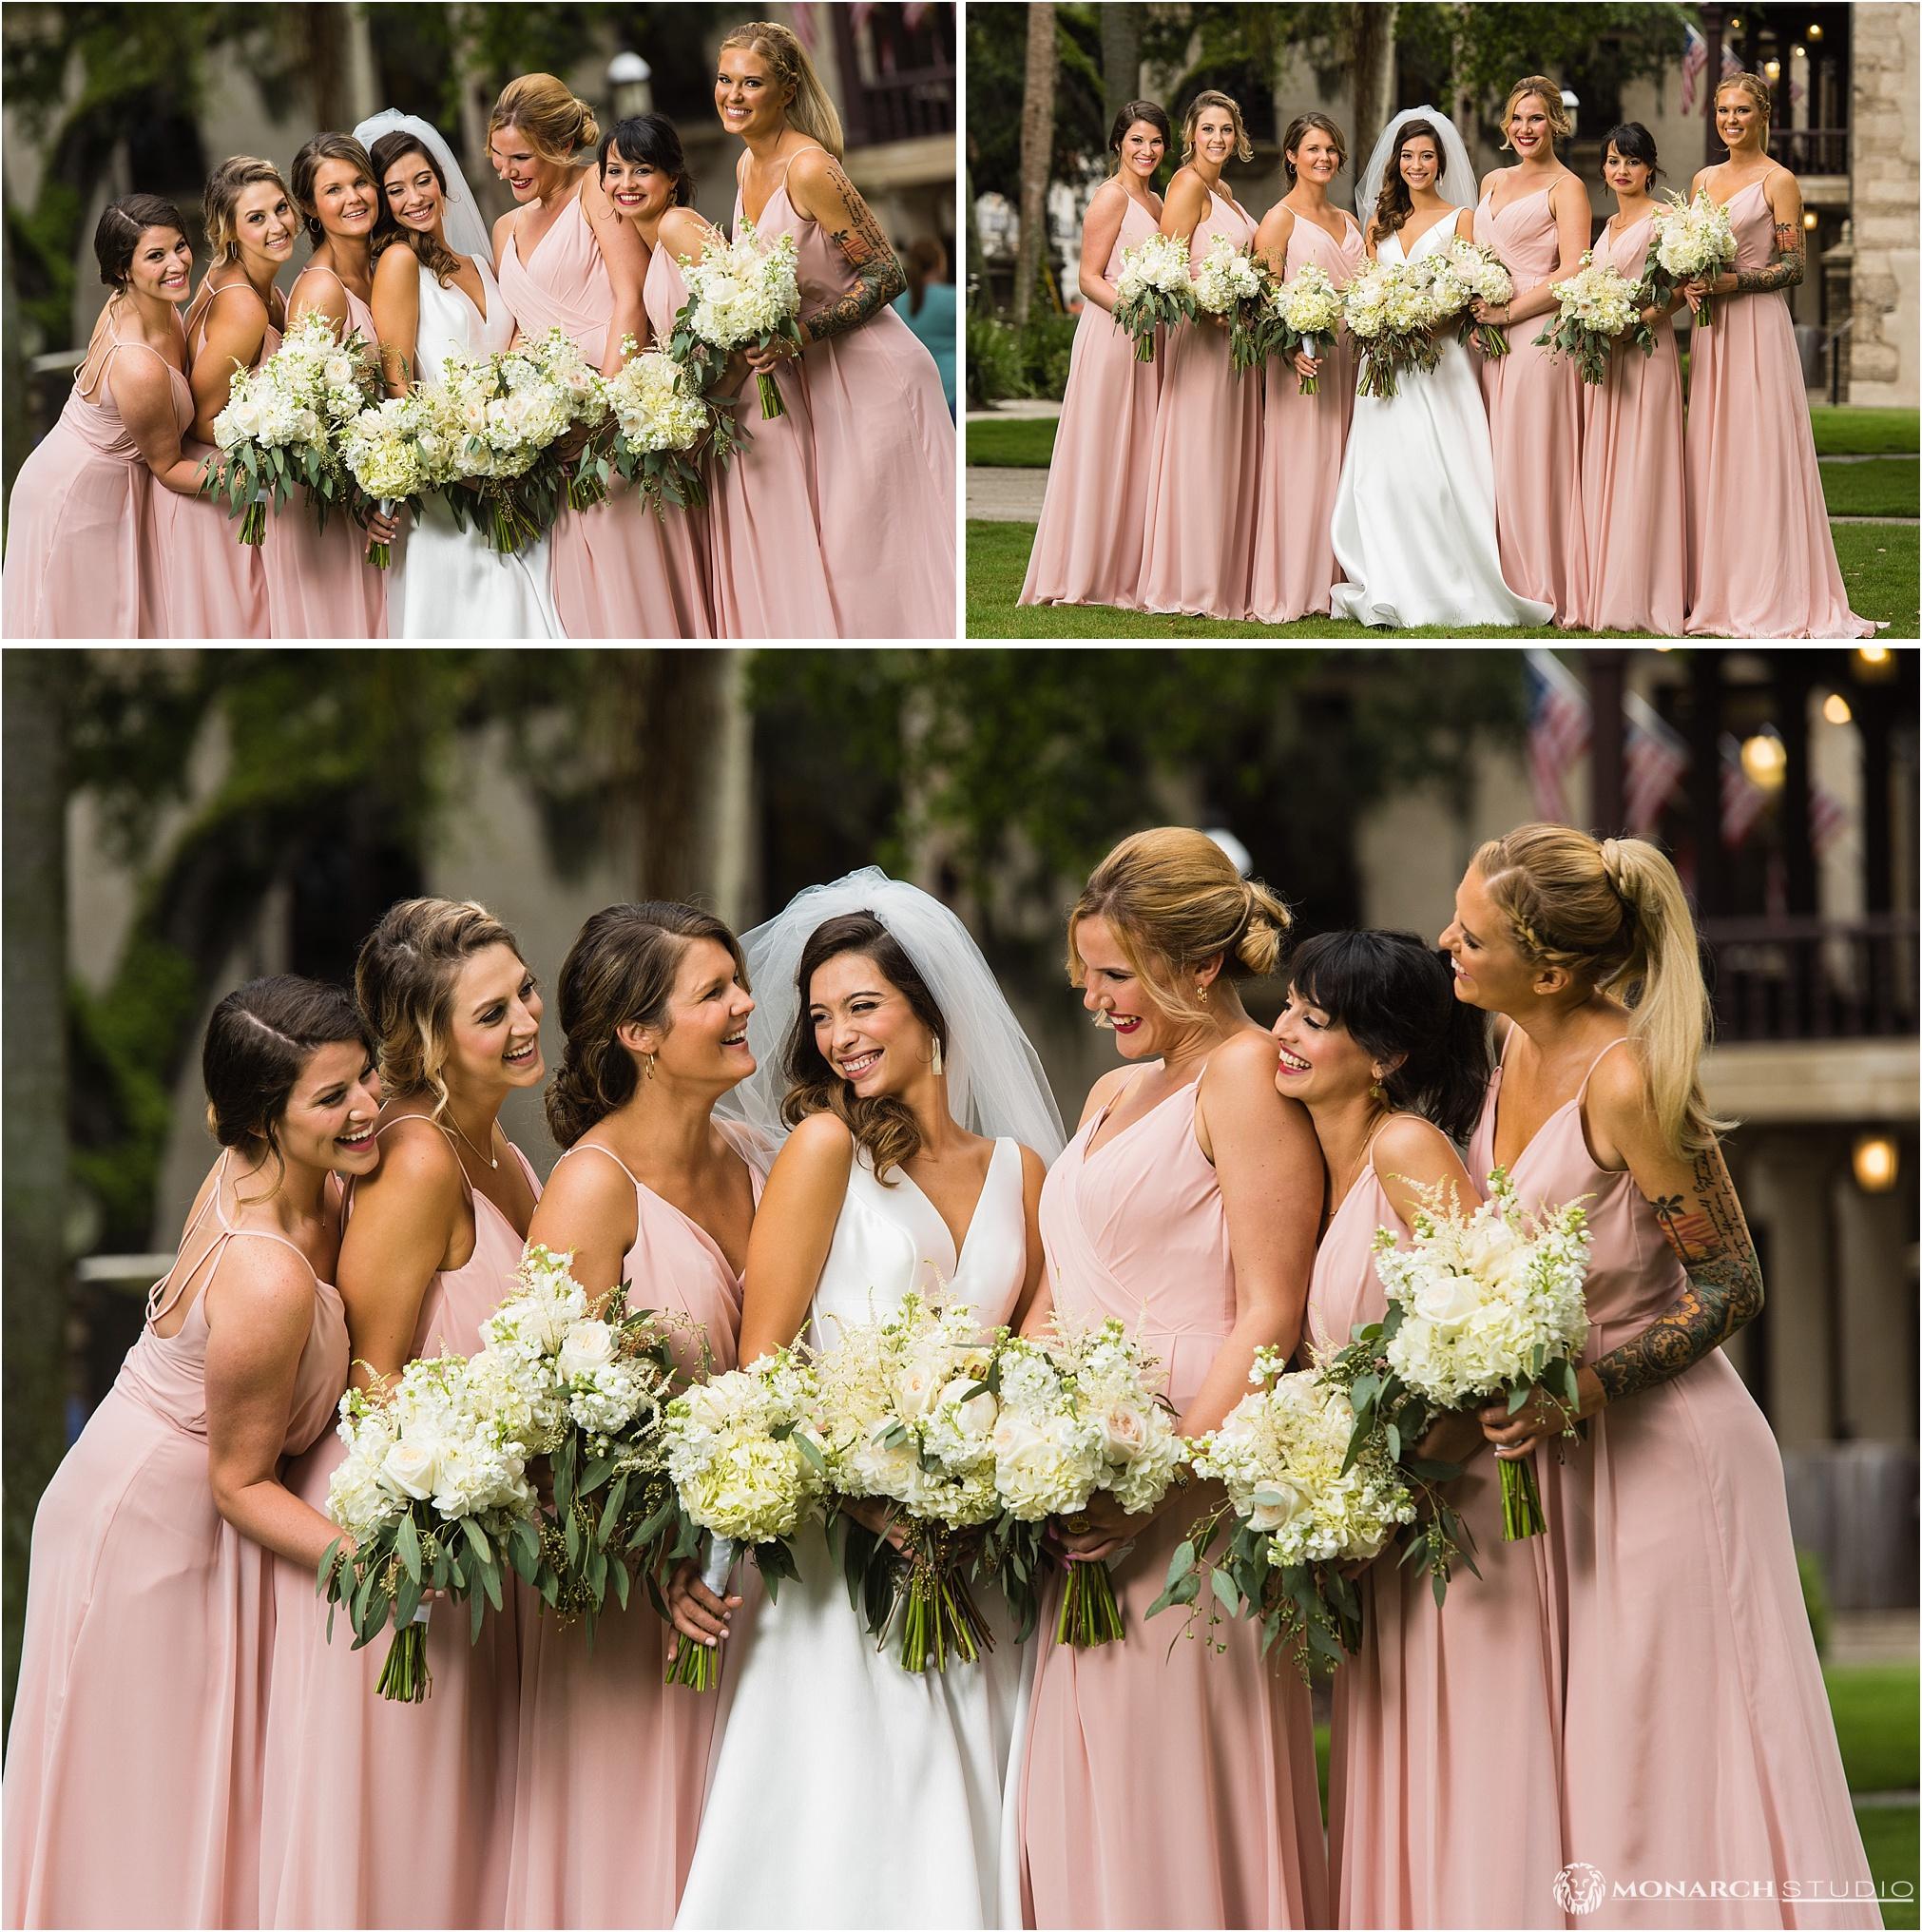 st-augustine-wedding-photographer-084.jpg